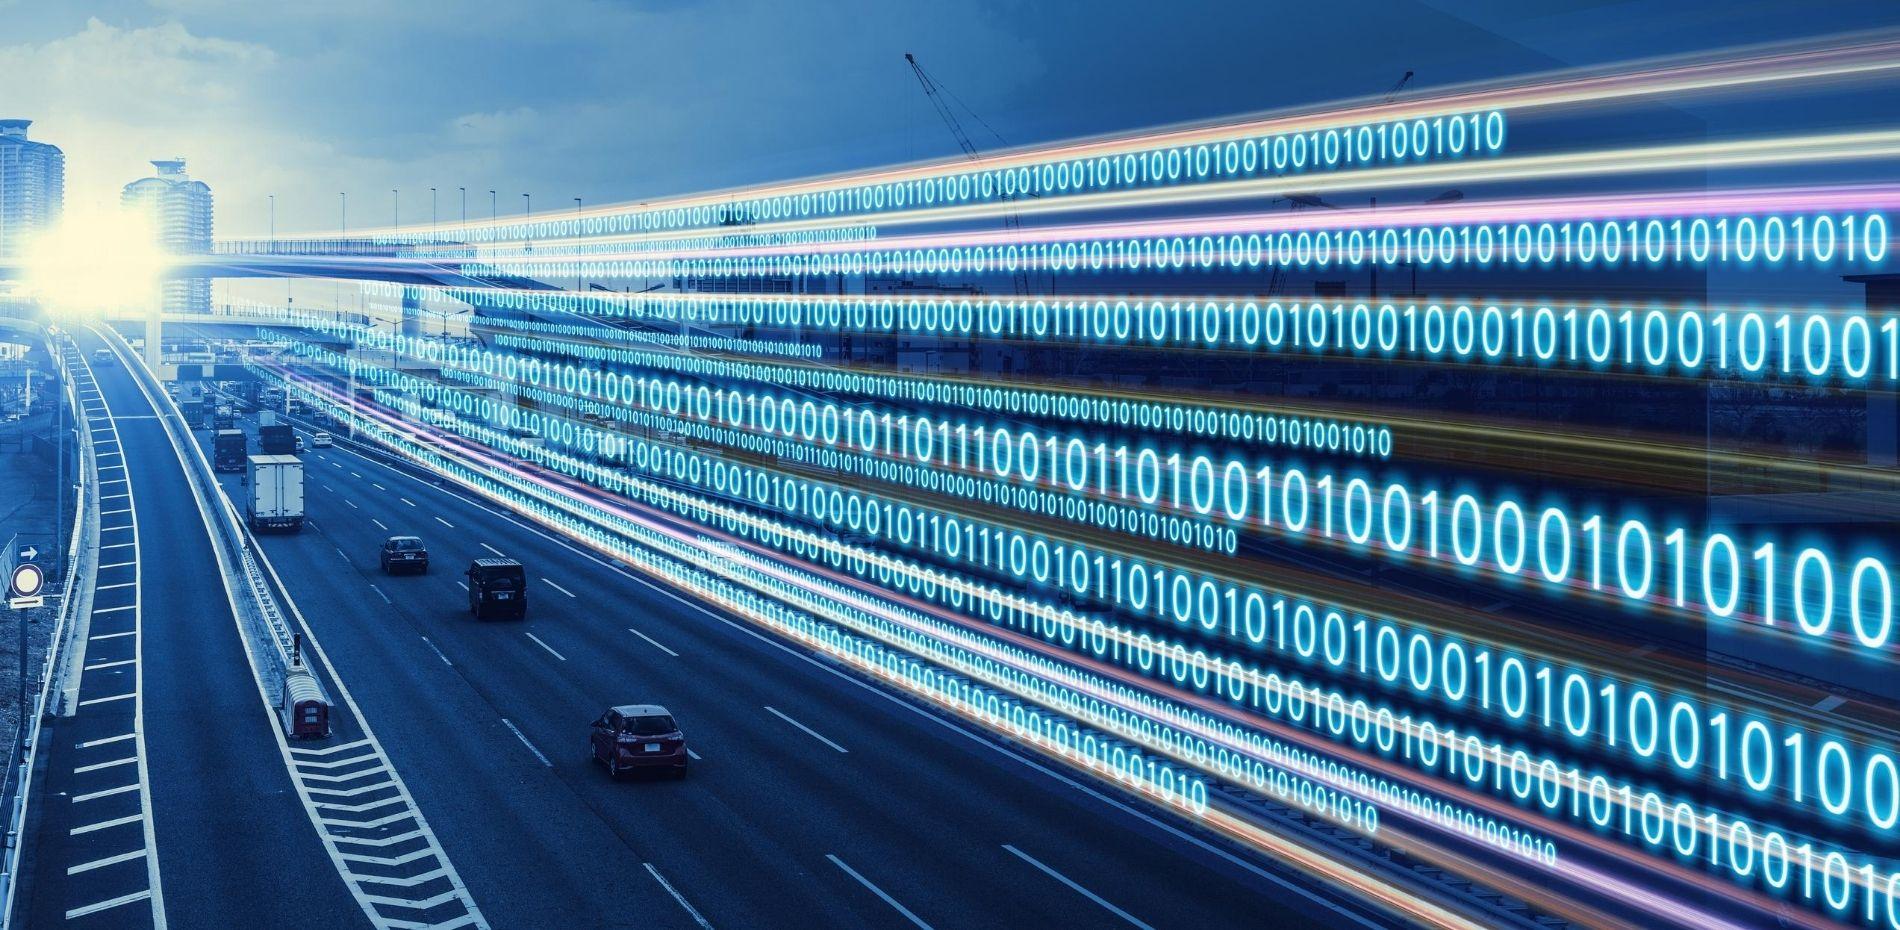 Digital transformation with binary code